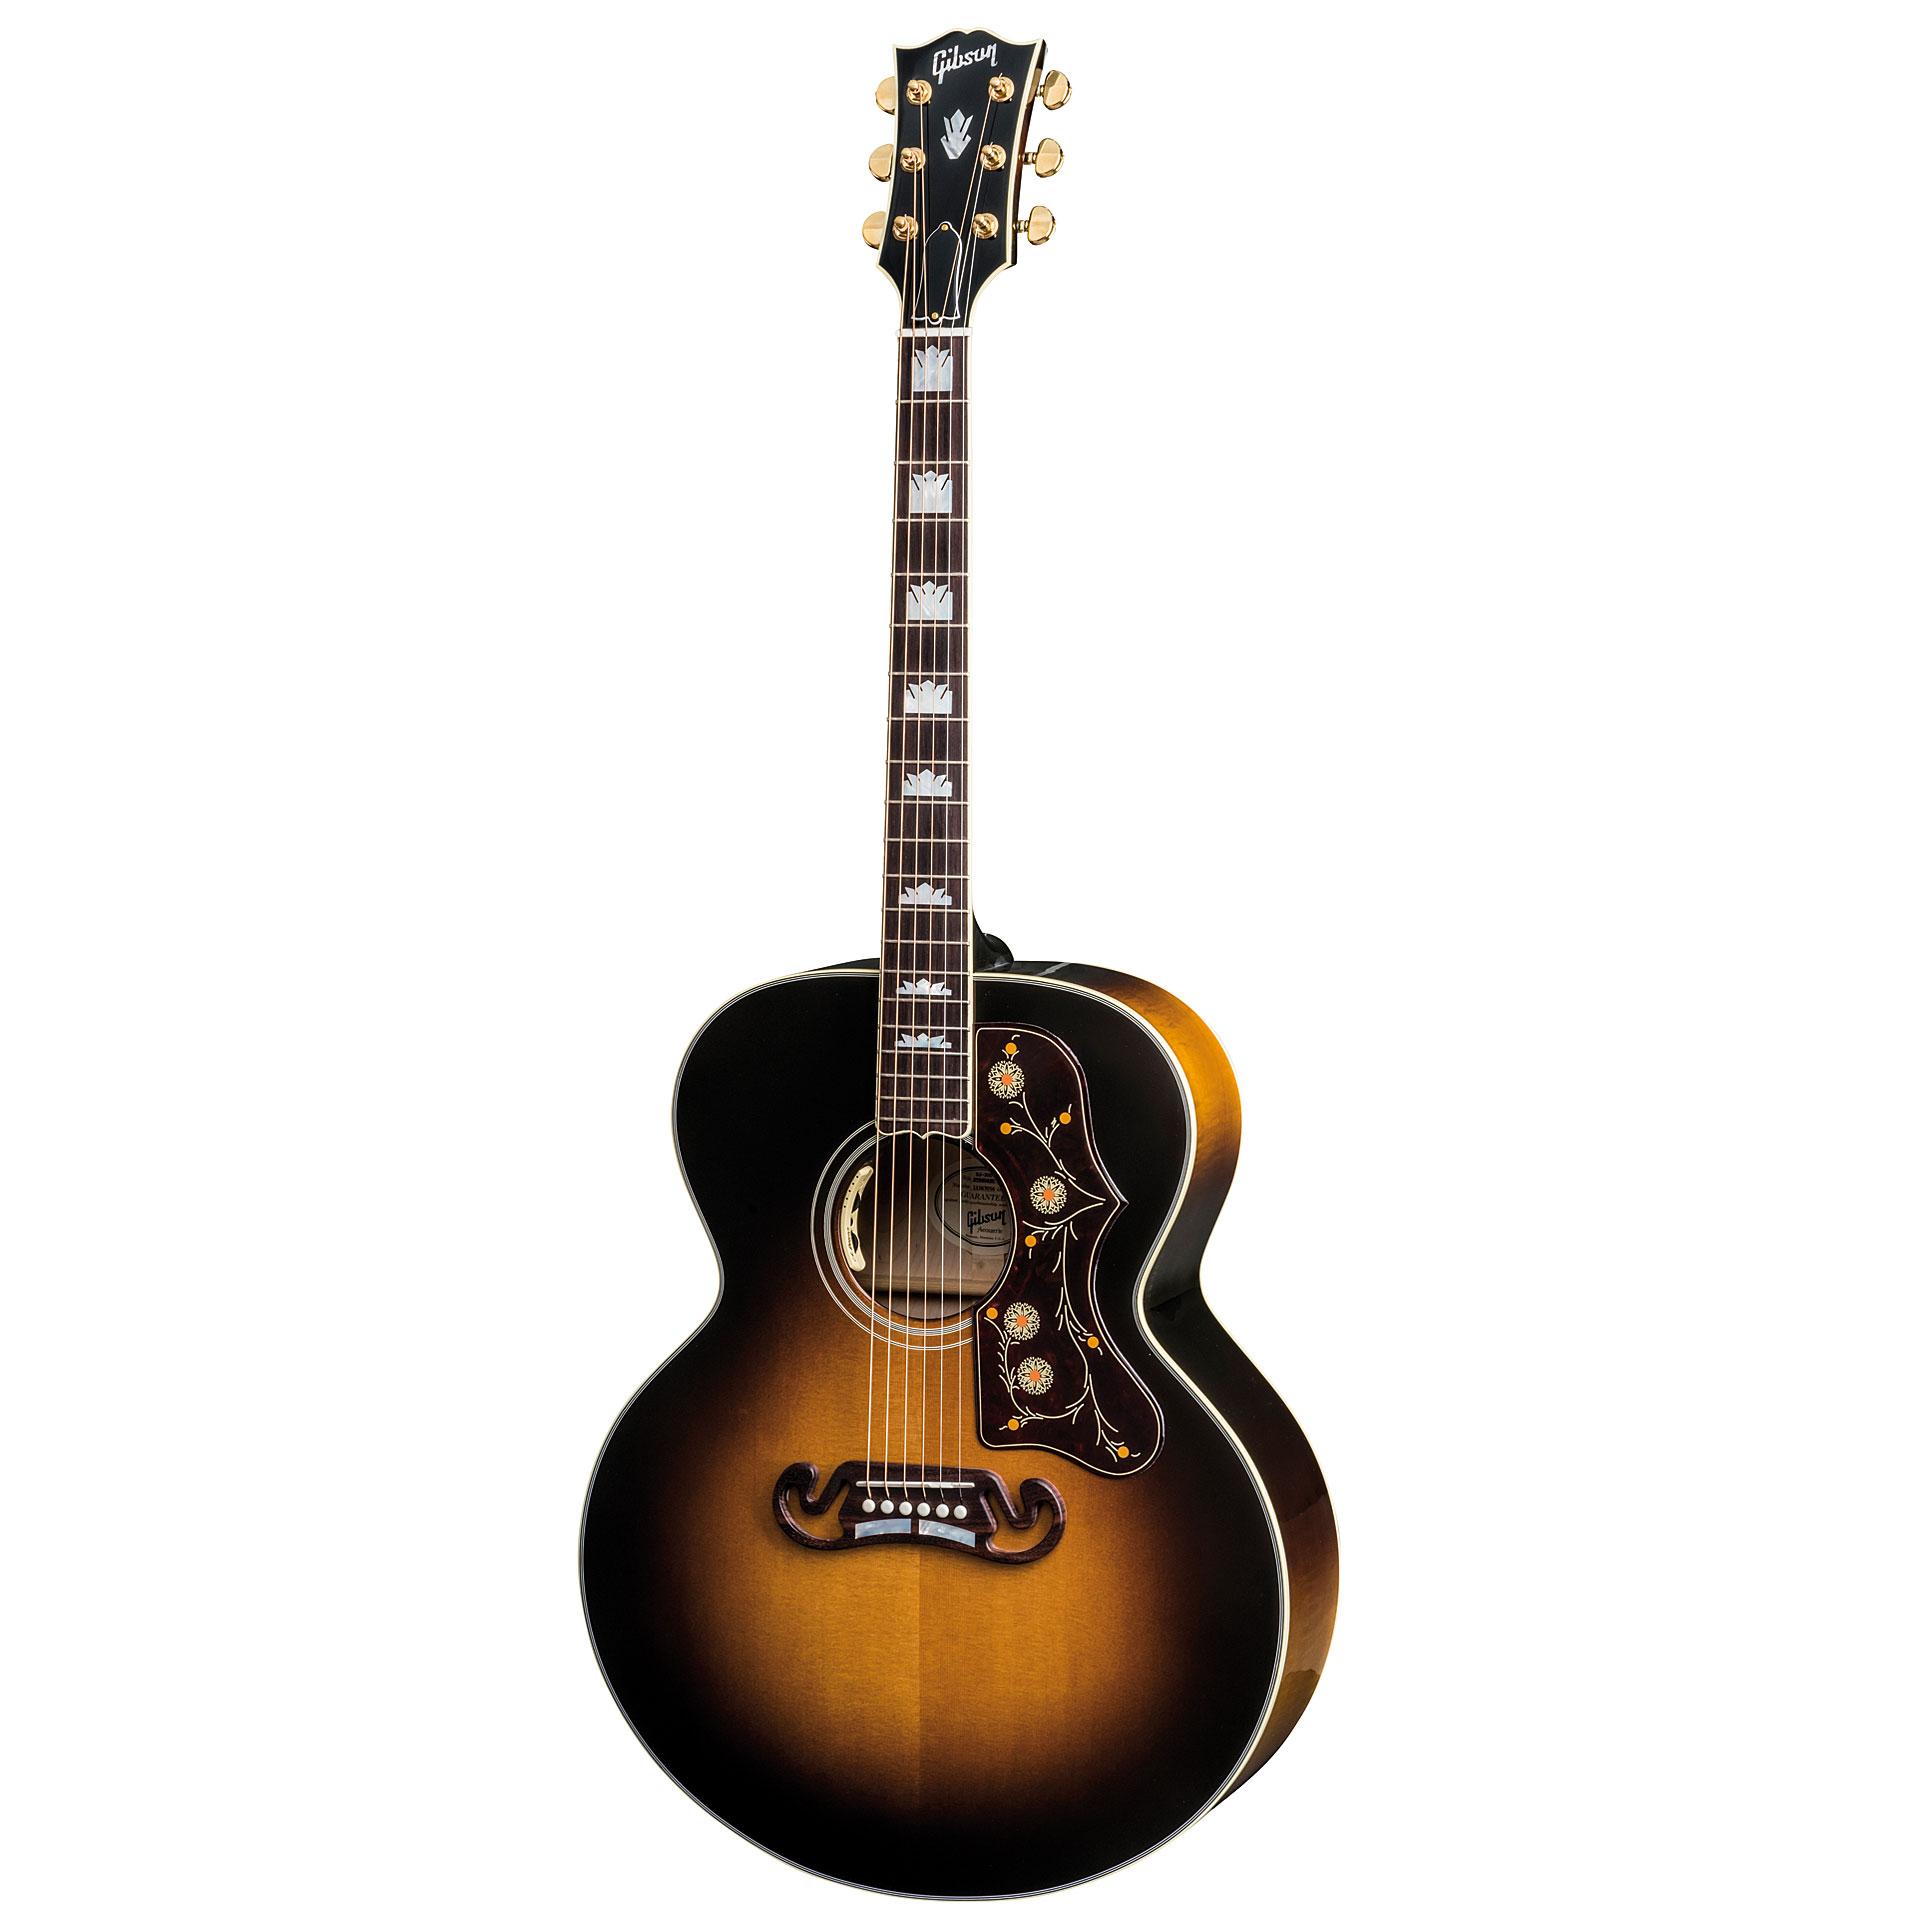 guitare acoustique 200 euros